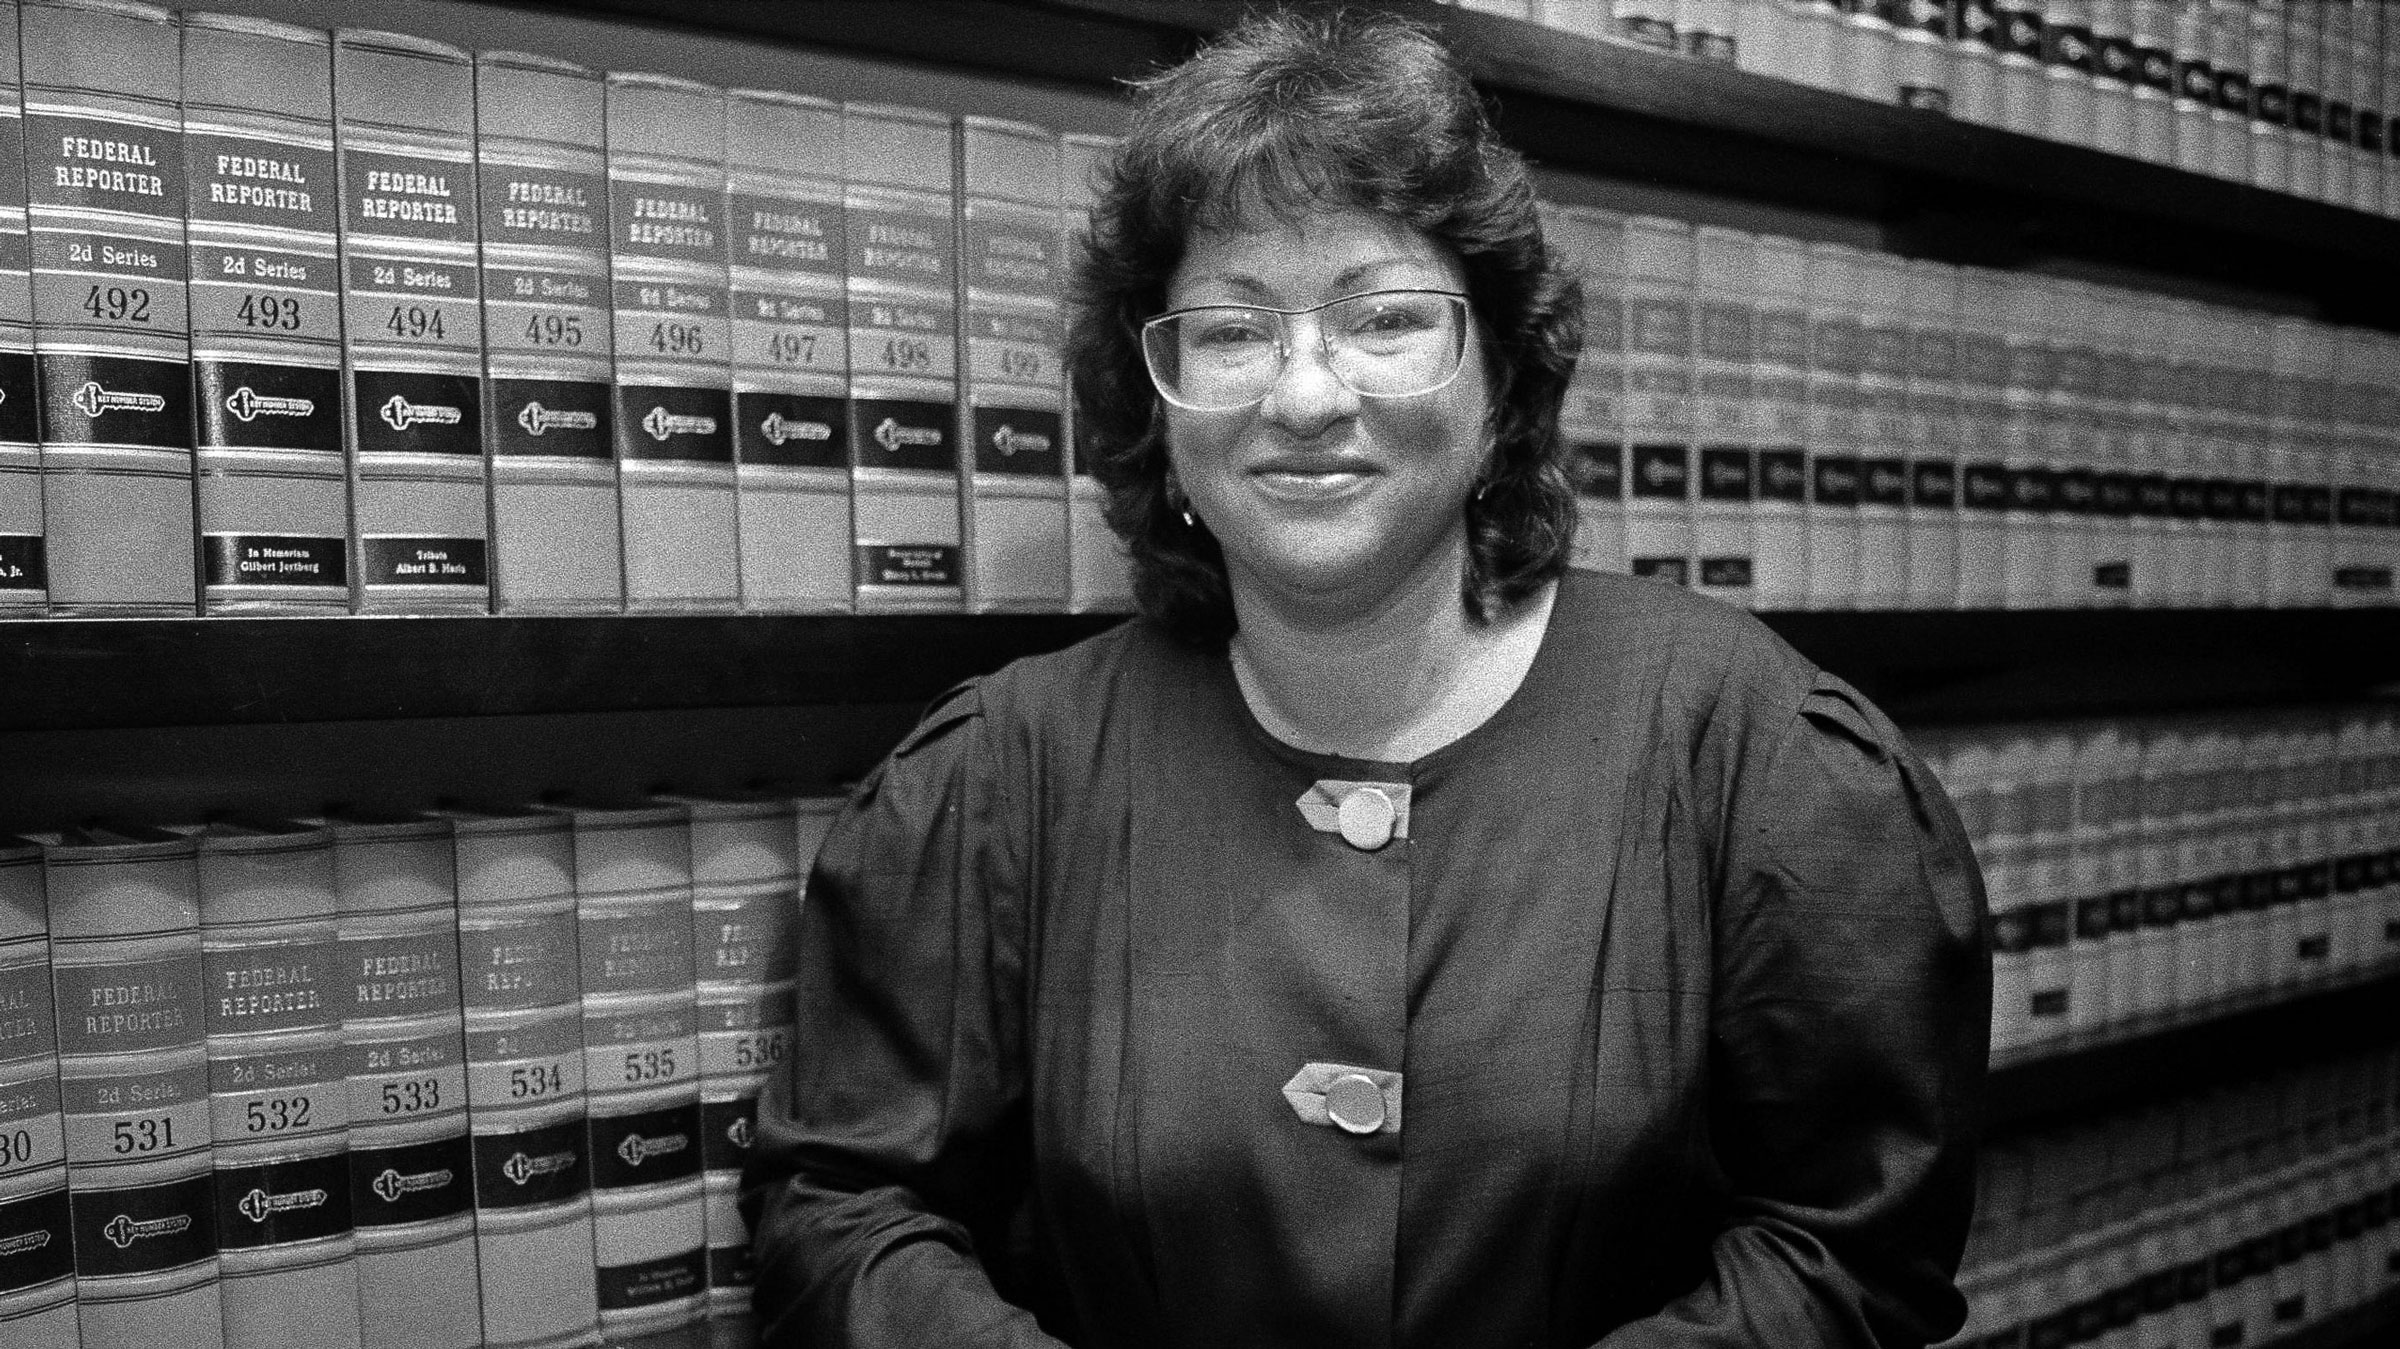 Sonia Sotomayor Cut Her Teeth Prosecuting the 'Tarzan Burglar'